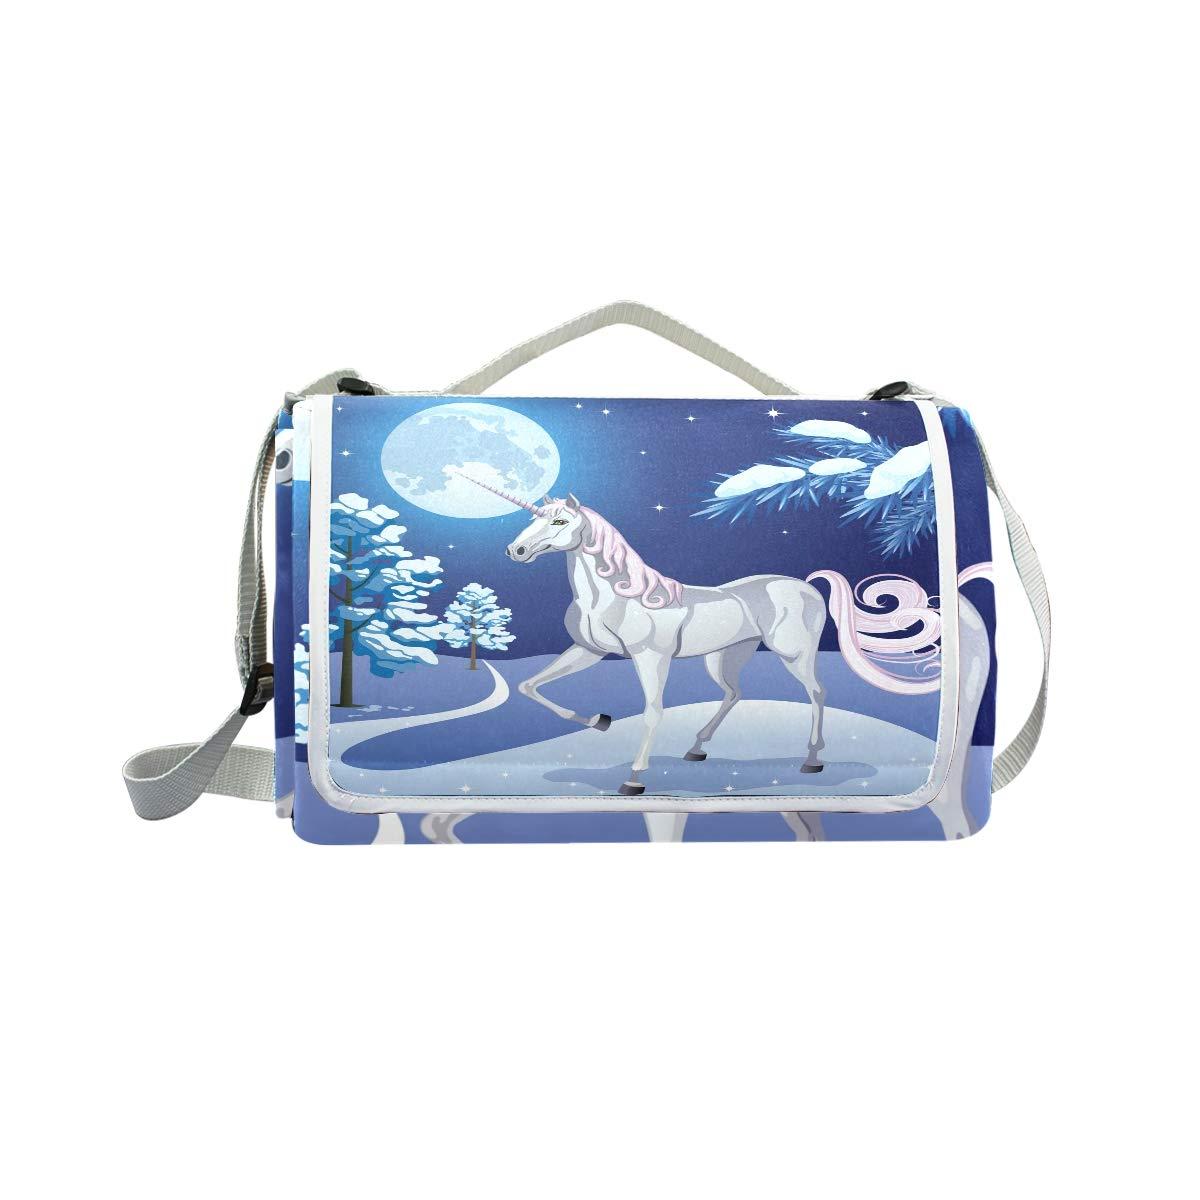 c9ebe578b jeansame - Manta de Picnic Picnic Picnic con dise ntilde o de Unicornio y  Luna